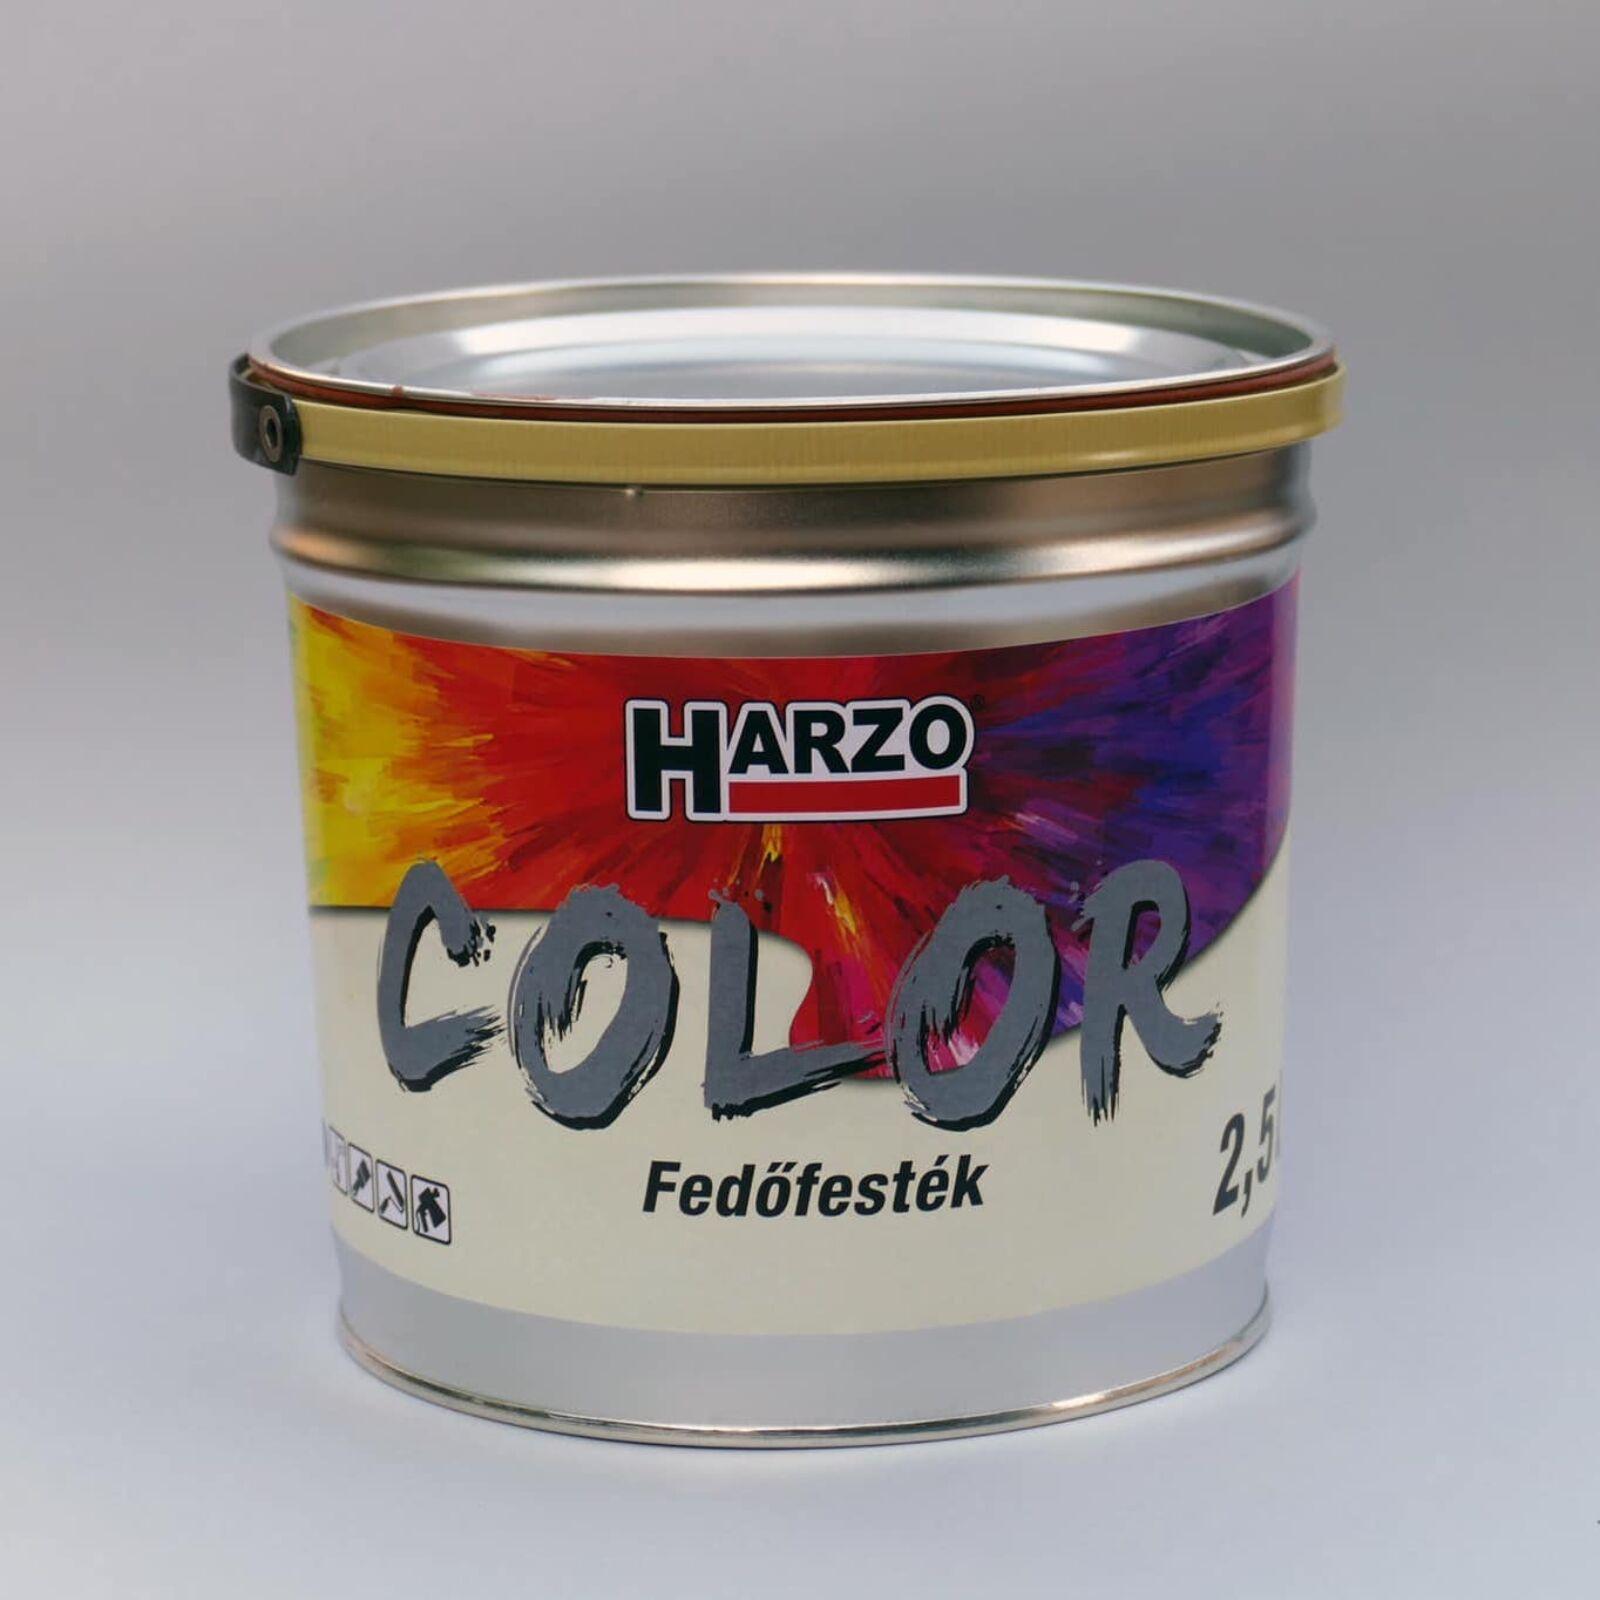 HARZO Color fedőfesték [2,5 lit]